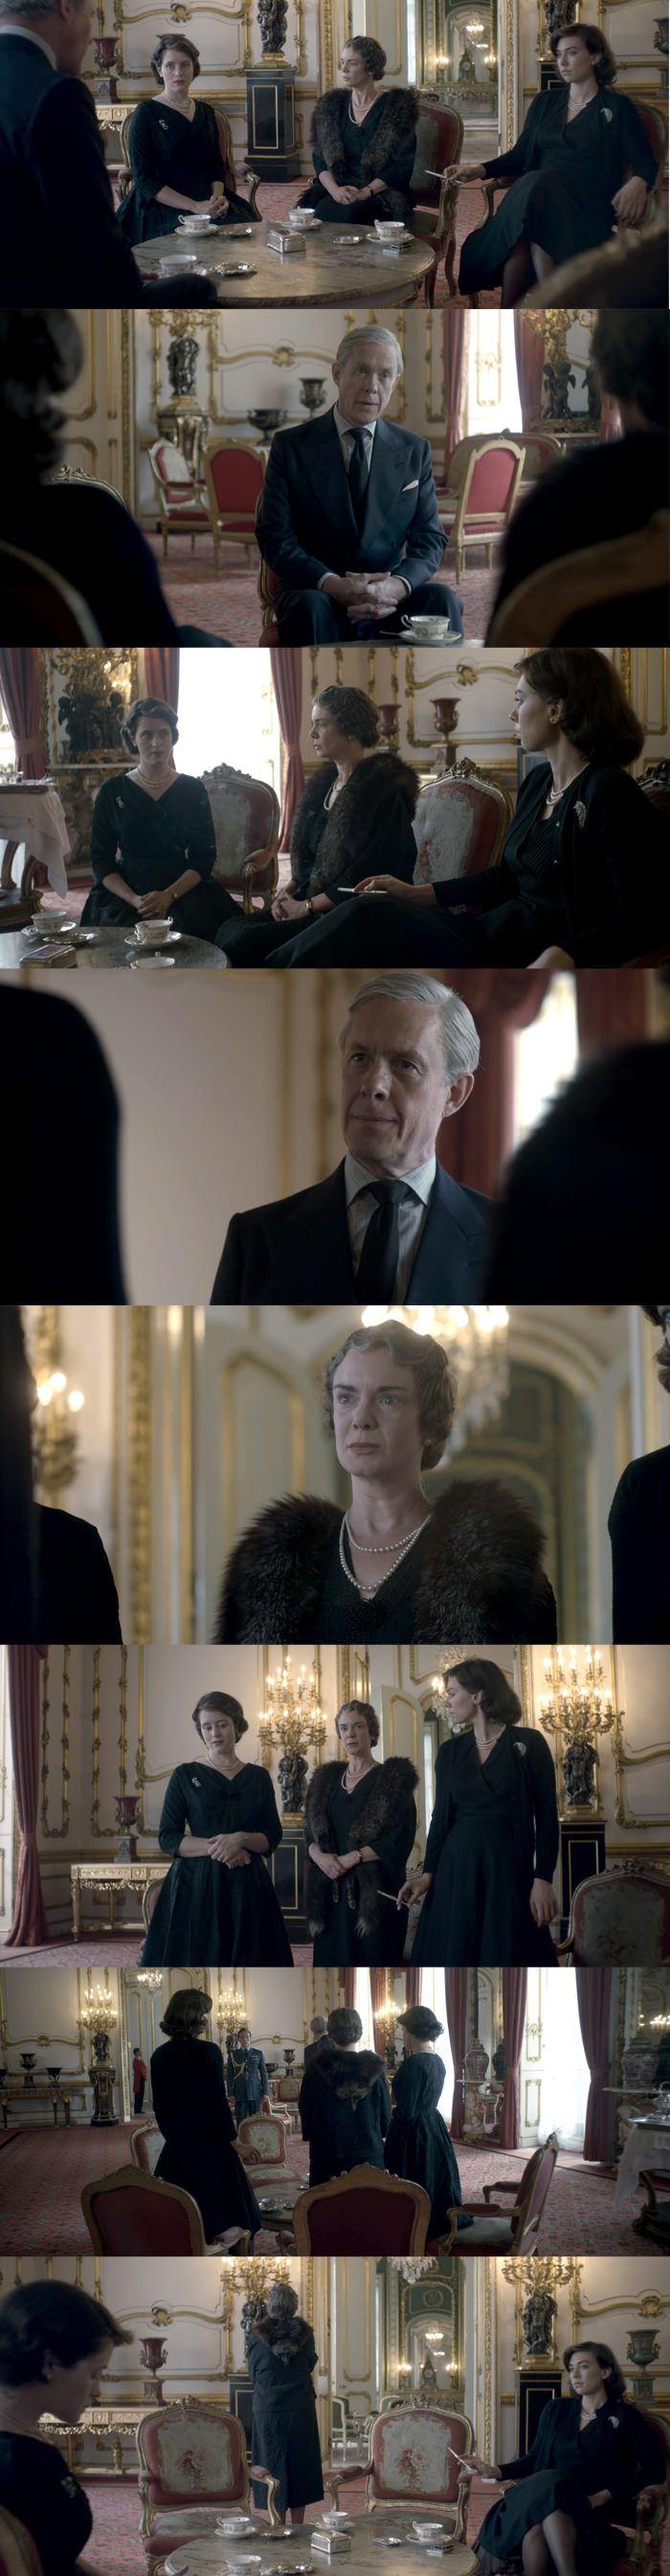 the-crown-style-season-1-episode-3-tv-series-netflix-costumes-analysis-tom-lorenzo-site-10